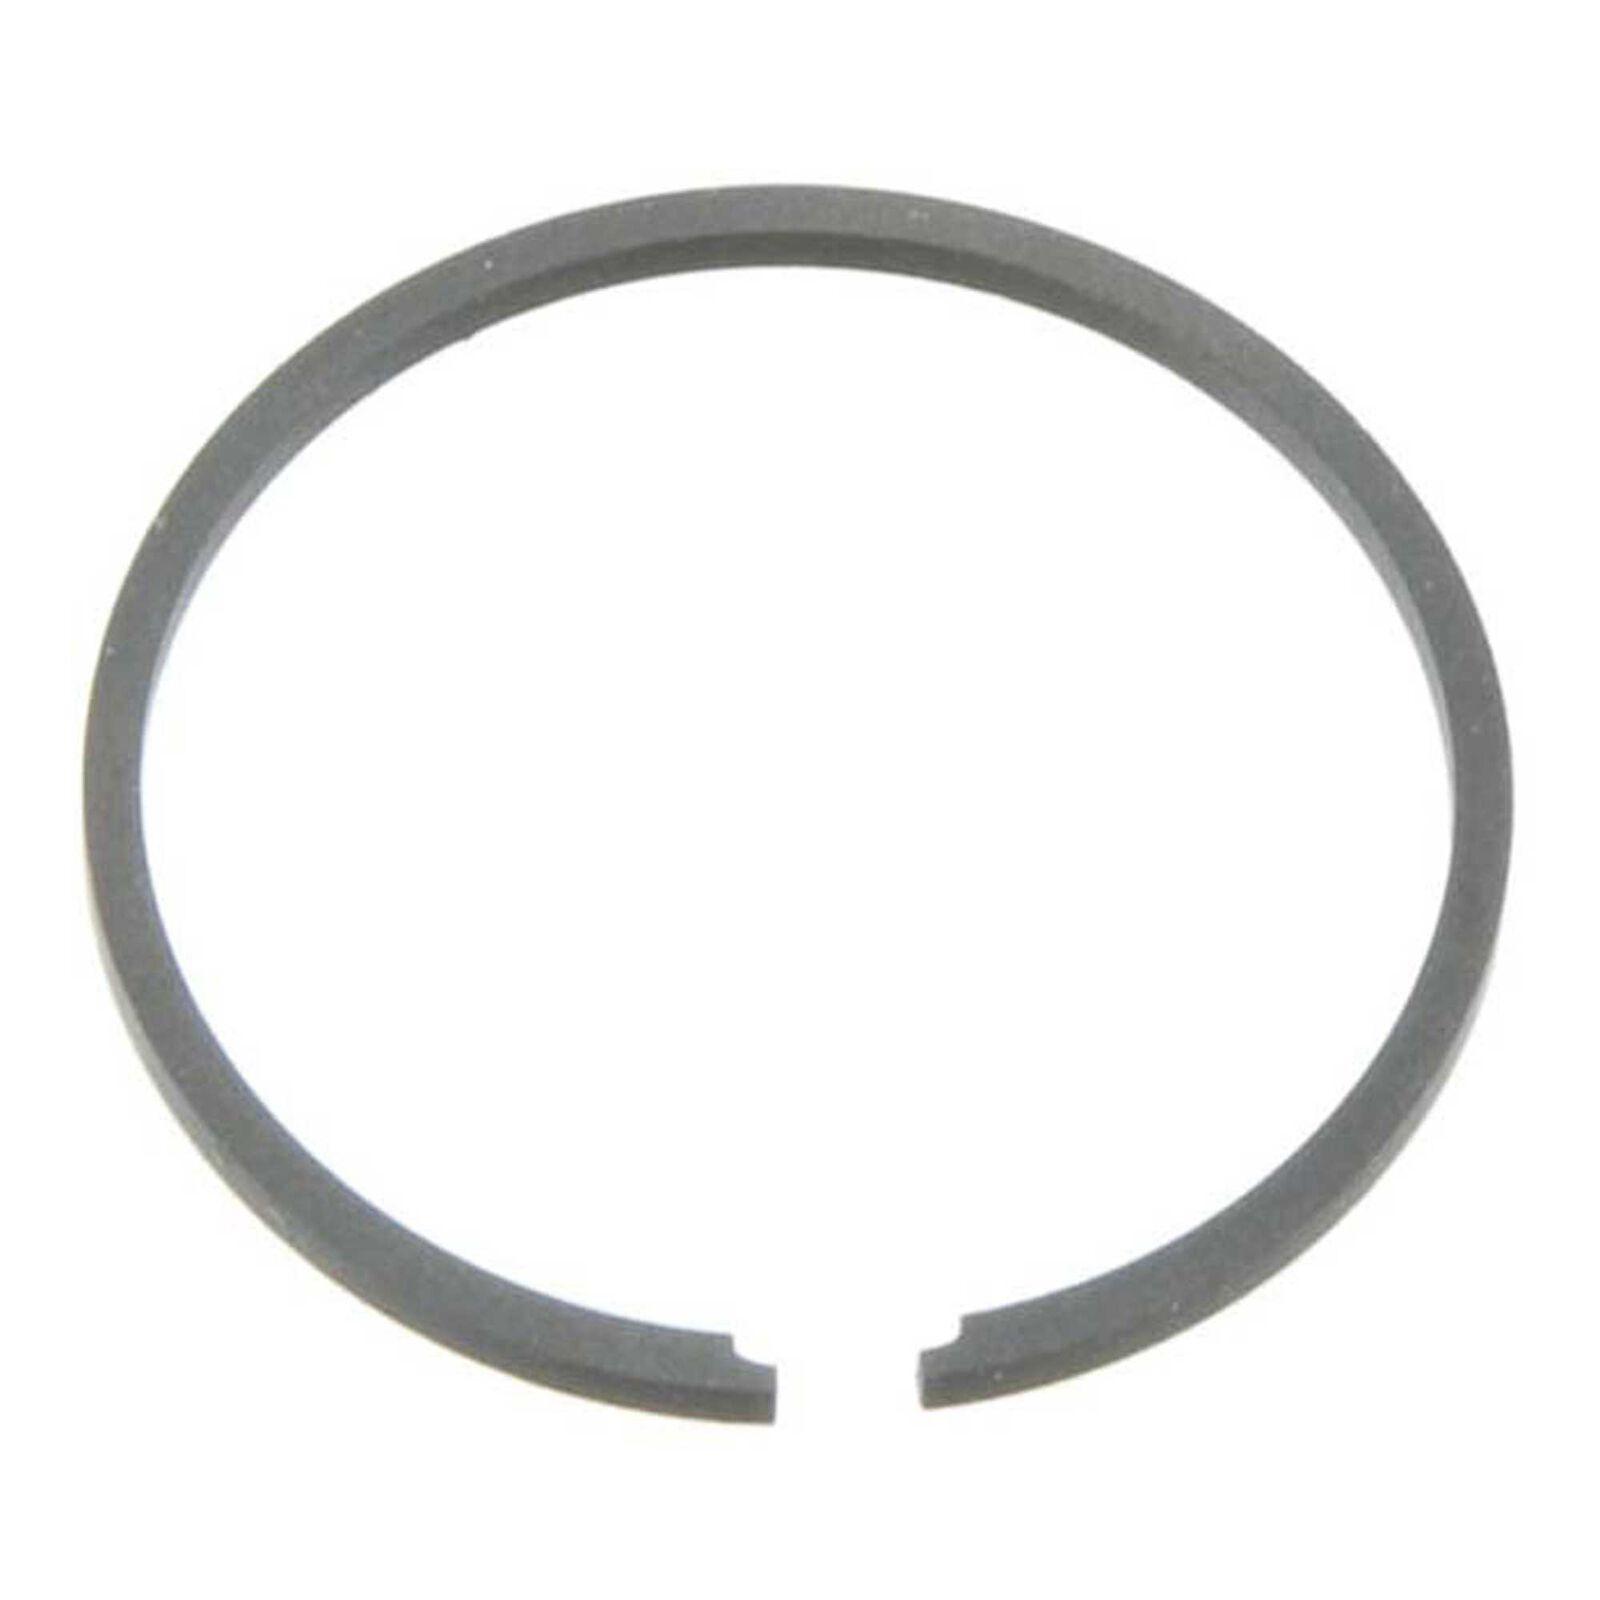 Piston Ring: 32FH